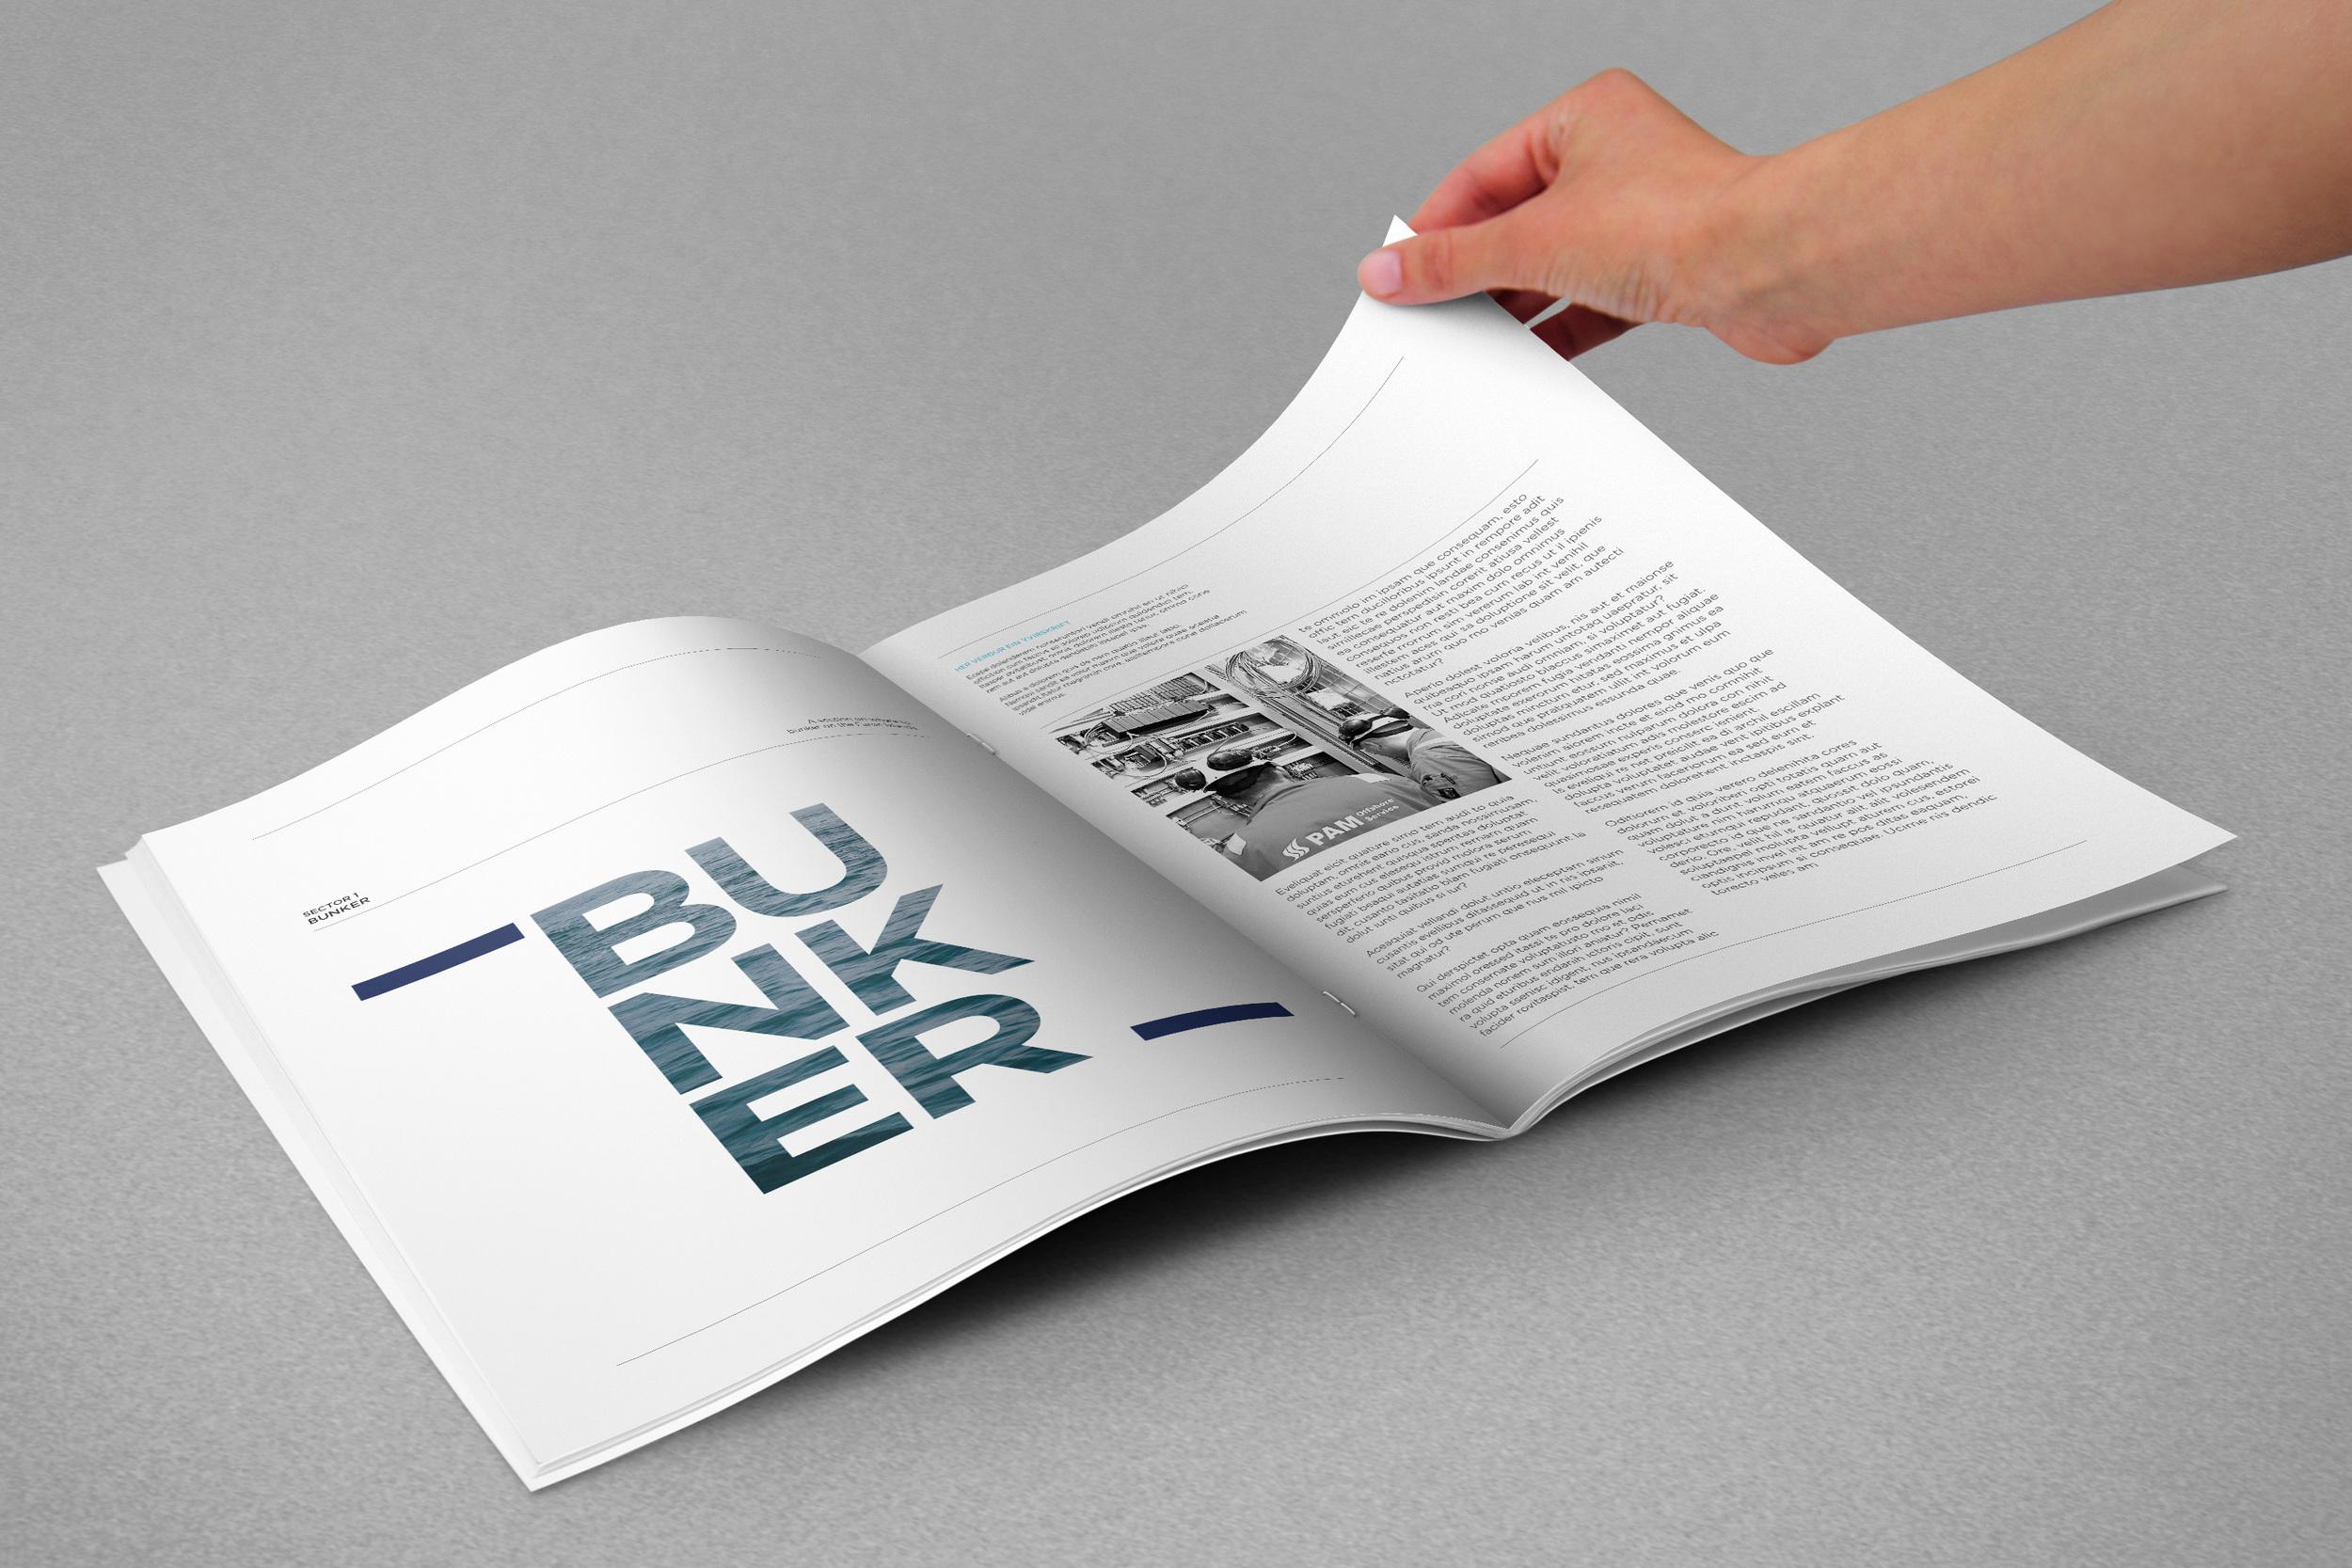 FIMS_Brochure-A4_Small.jpg